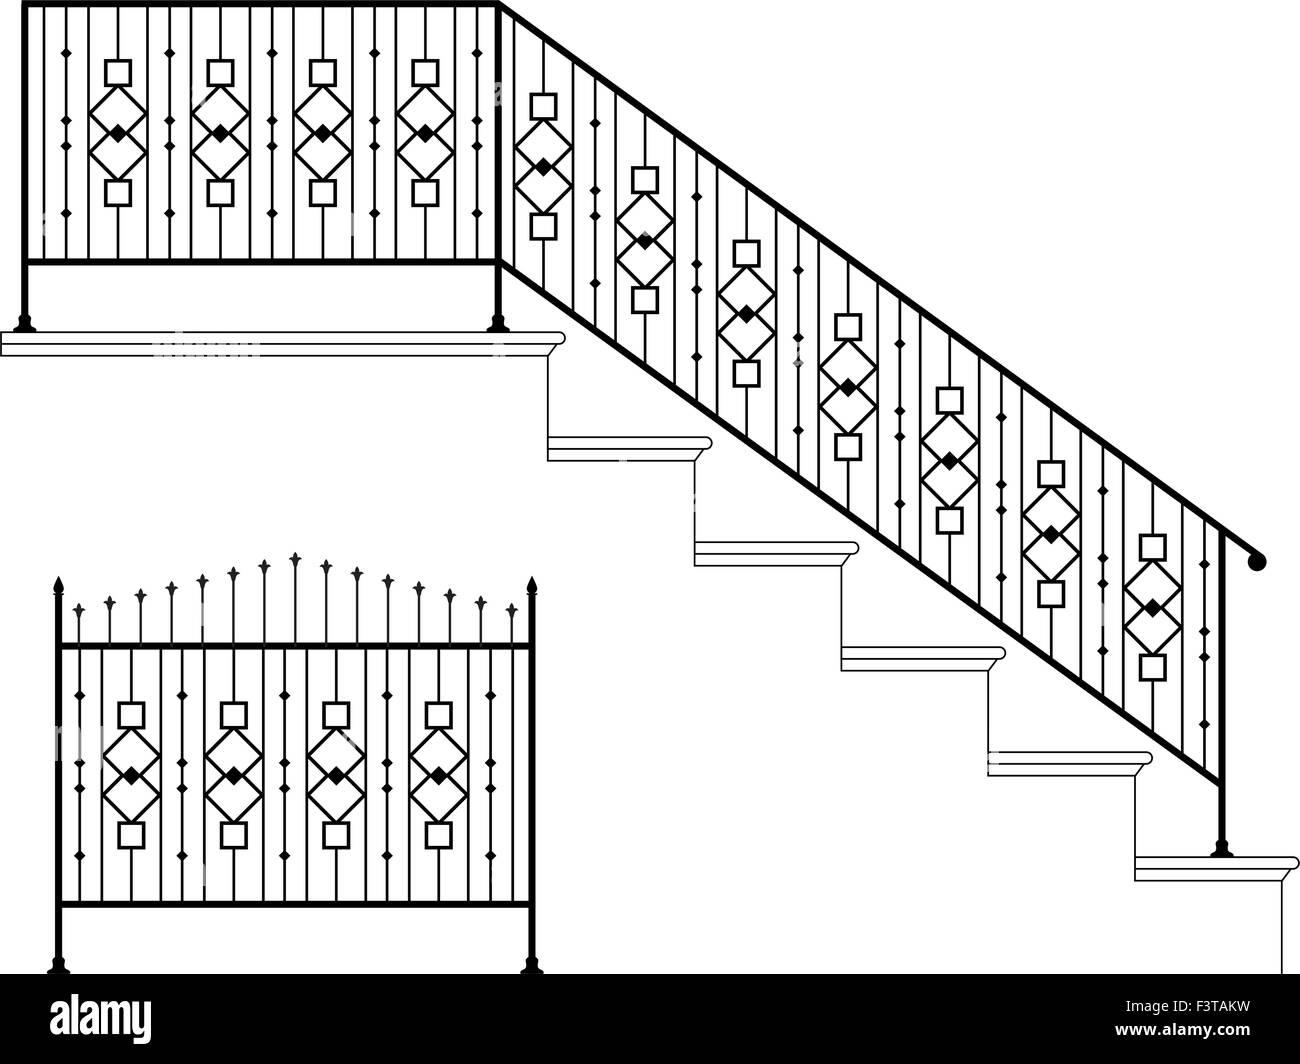 hight resolution of wrought iron stair railing design vector art